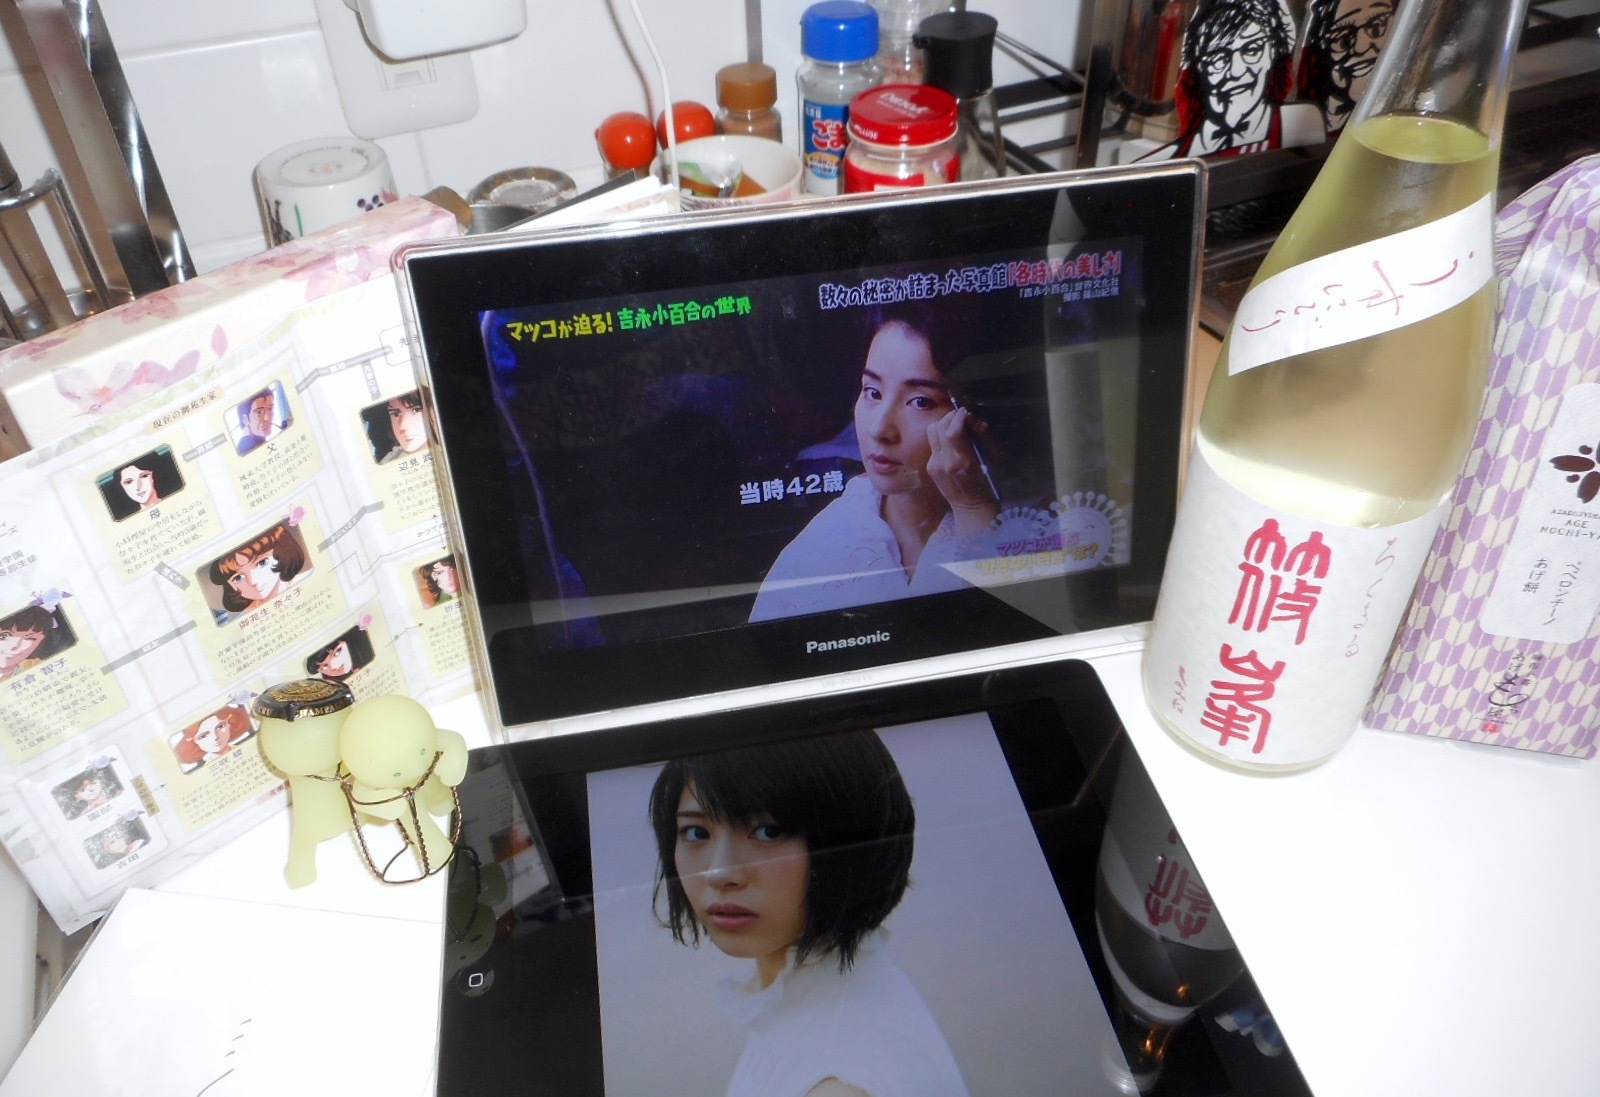 rokumaru_oyama_usunigori29by1.jpg